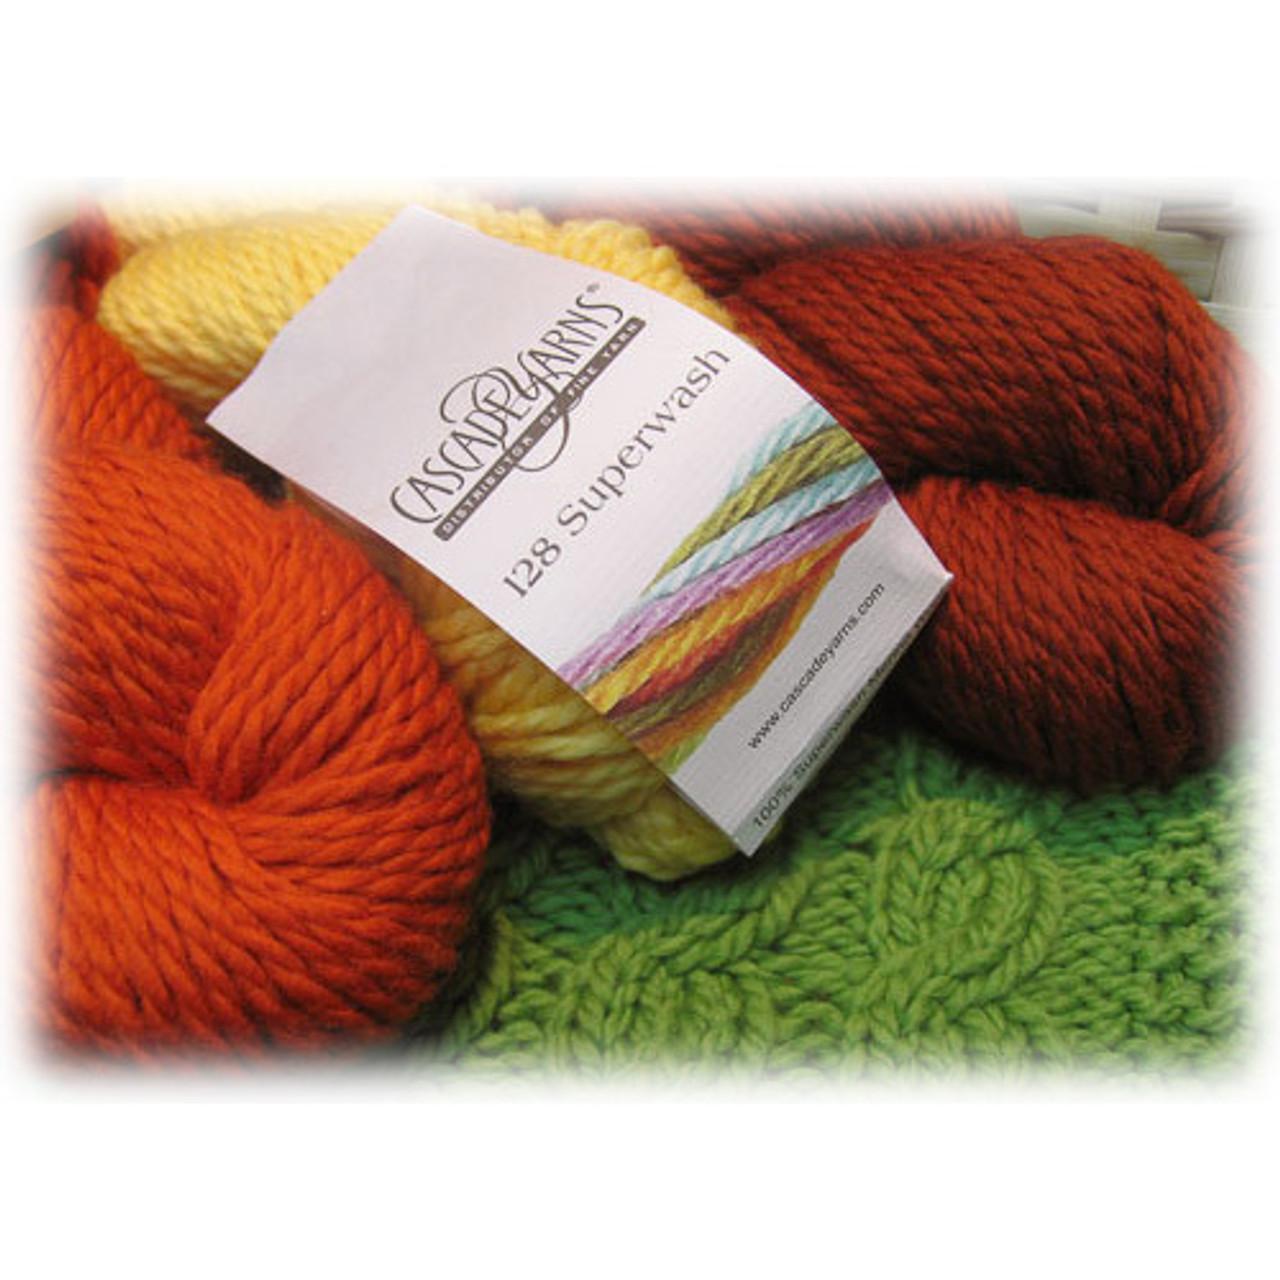 Yarn - Yarn by Size - [5] Bulky Weight Yarn - Cascade - 128 Superwash - Page 1 - Angelika's Yarn Store